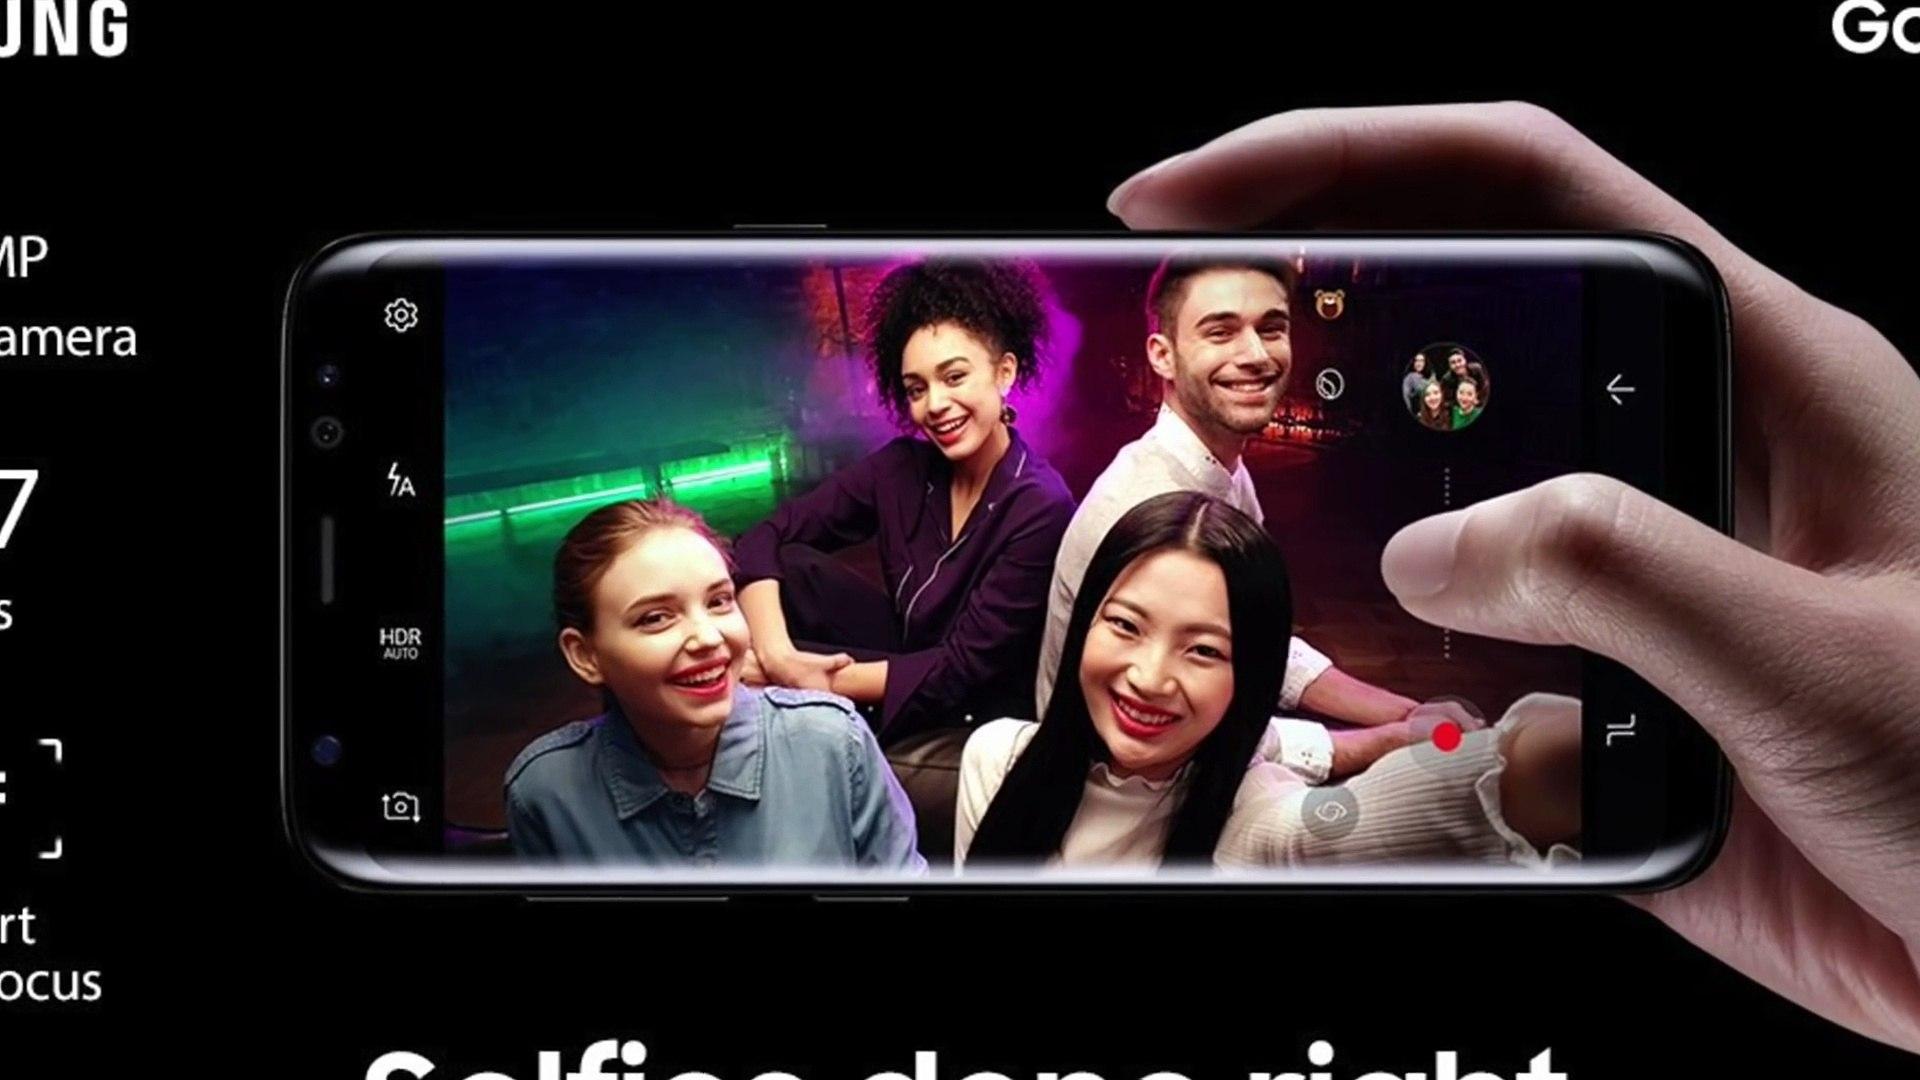 Samsung Galaxy S8 Giveaway The Best Galaxy Technical Guruji